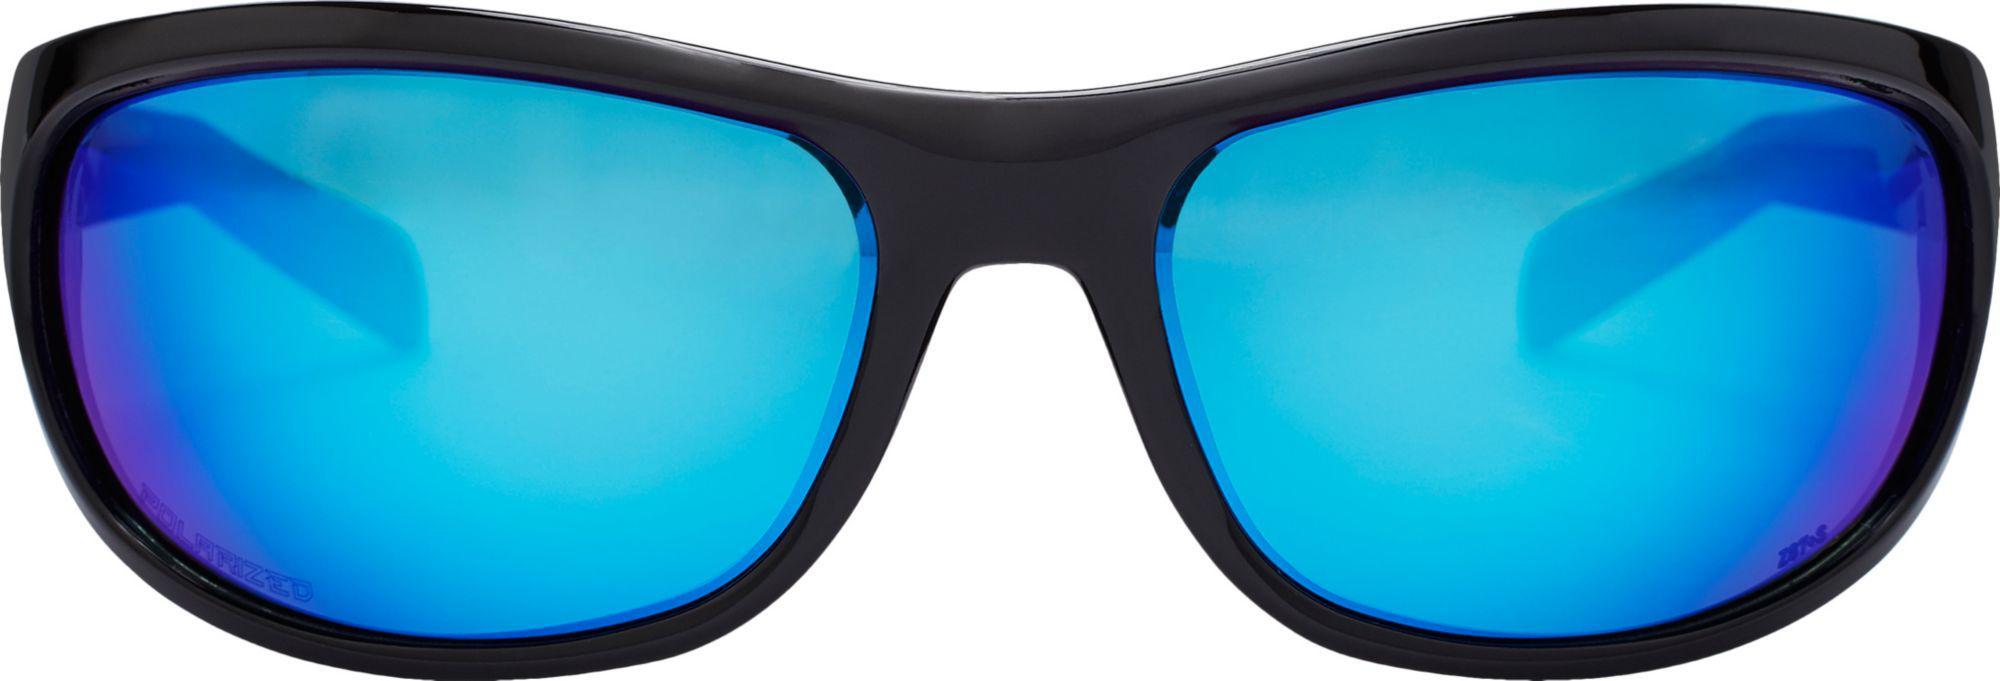 f458d12ff259 Lyst - Under Armour Capture Storm Polarized Sunglasses for Men